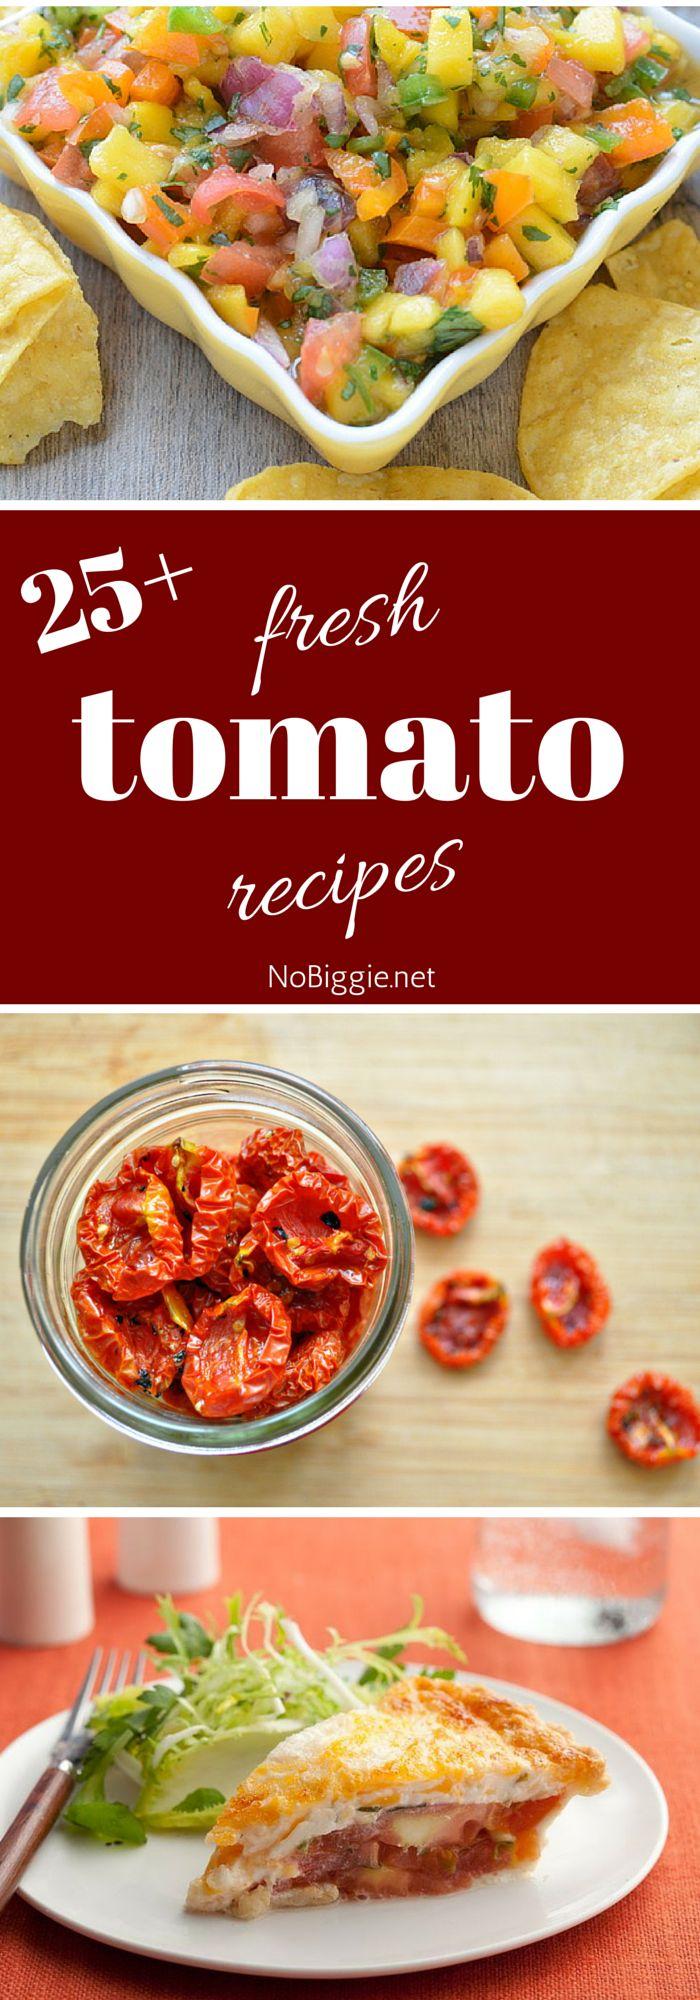 25+ fresh tomato recipes